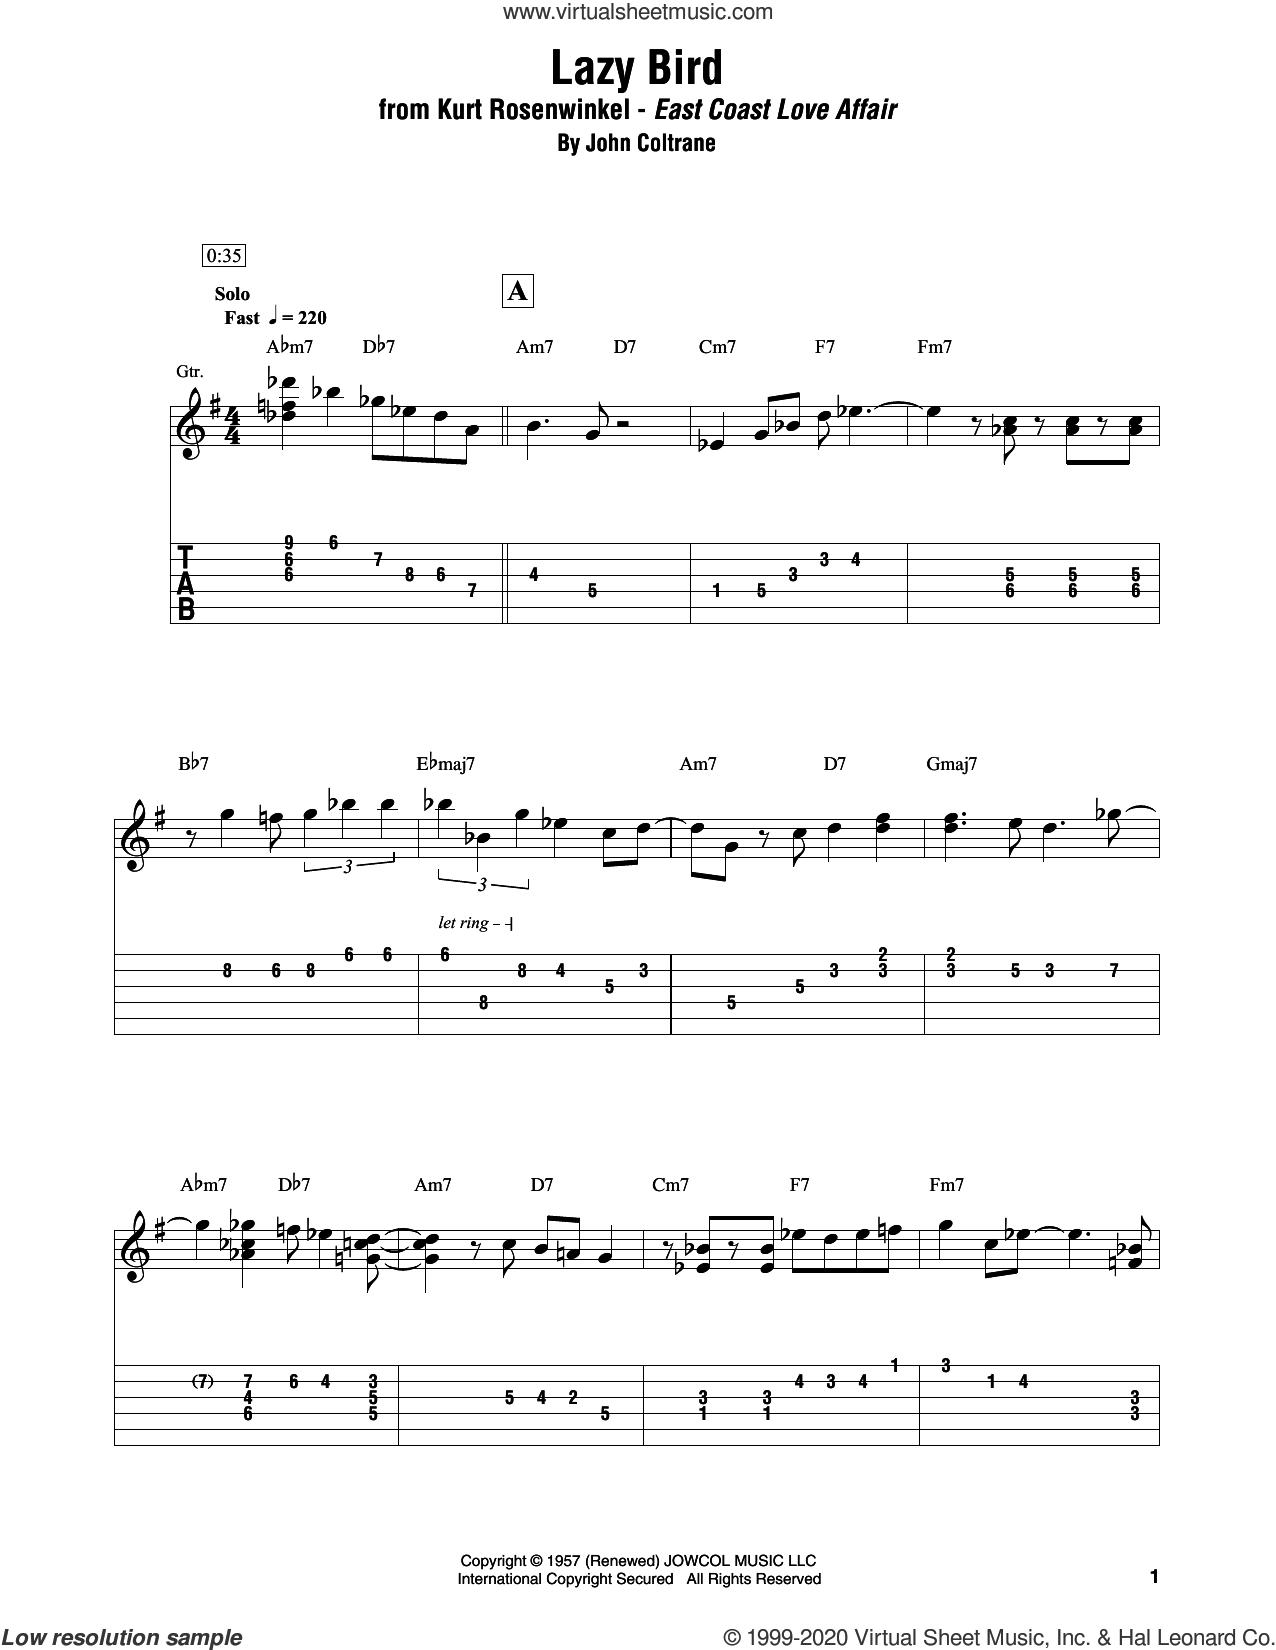 Lazy Bird sheet music for electric guitar (transcription) by Kurt Rosenwinkel and John Coltrane, intermediate skill level